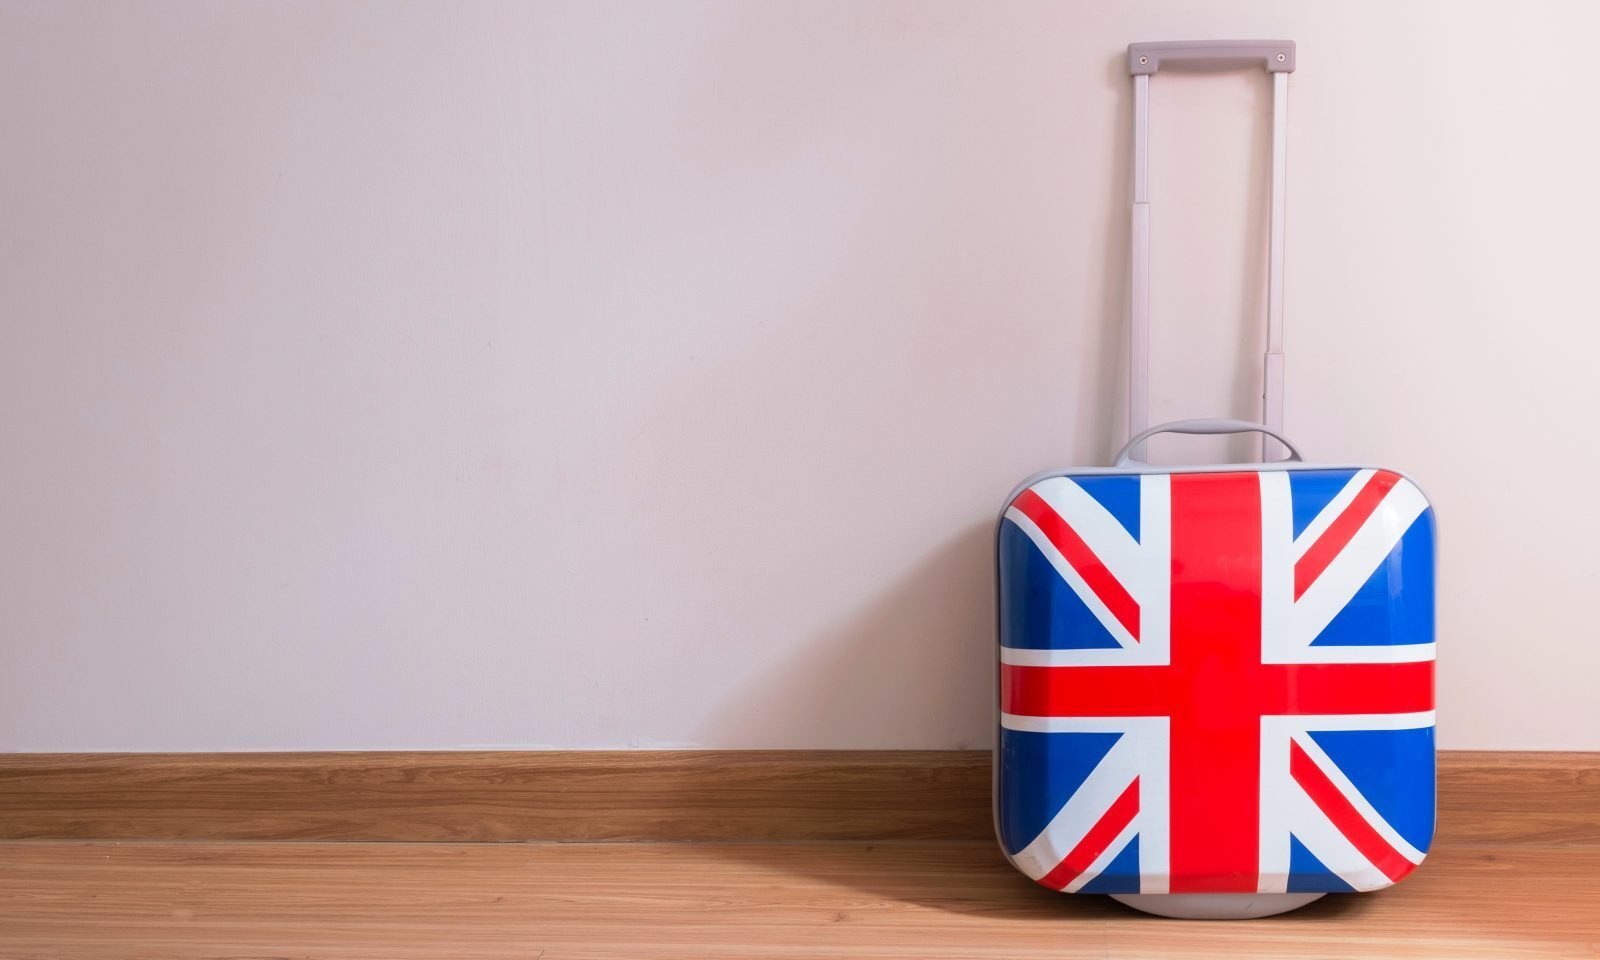 Article 50 - launch of divorce procedure marks start of Yellow Brit Road